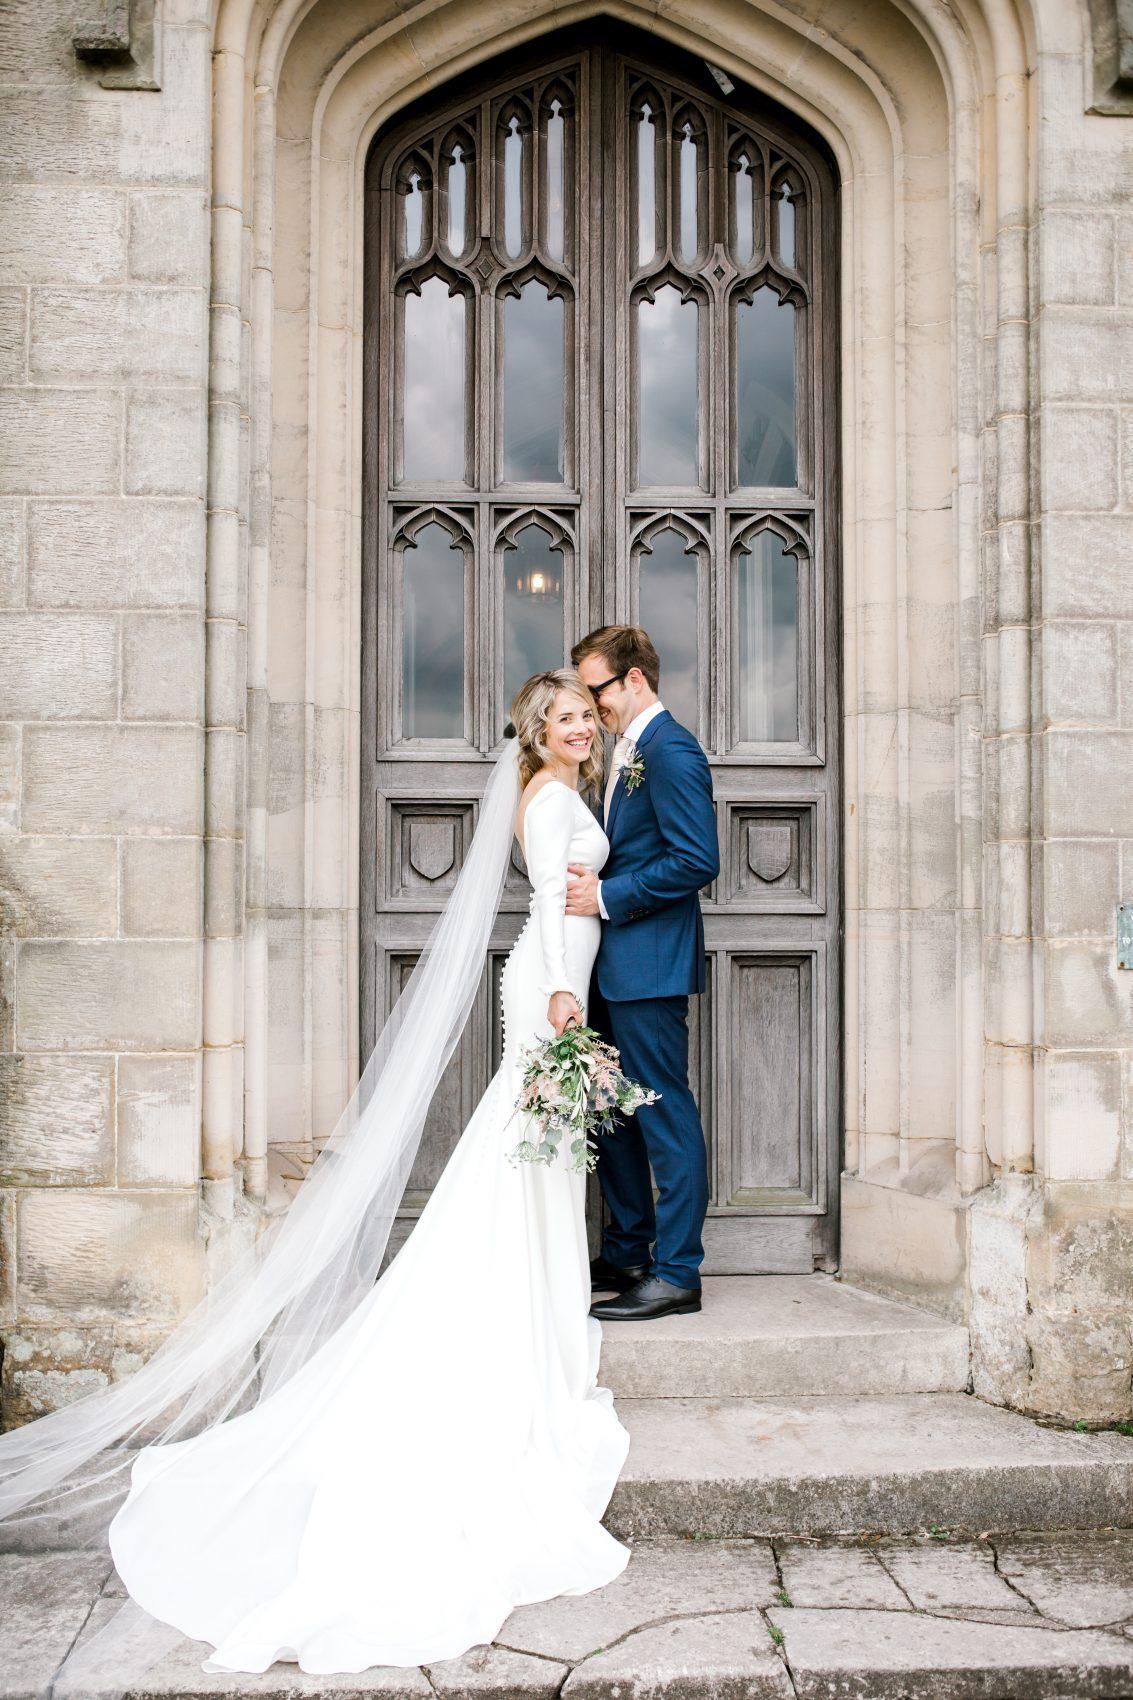 Chiddingstone Castle Wedding - Mikaella Bridal 2105 - Sam Areman Photo-2710